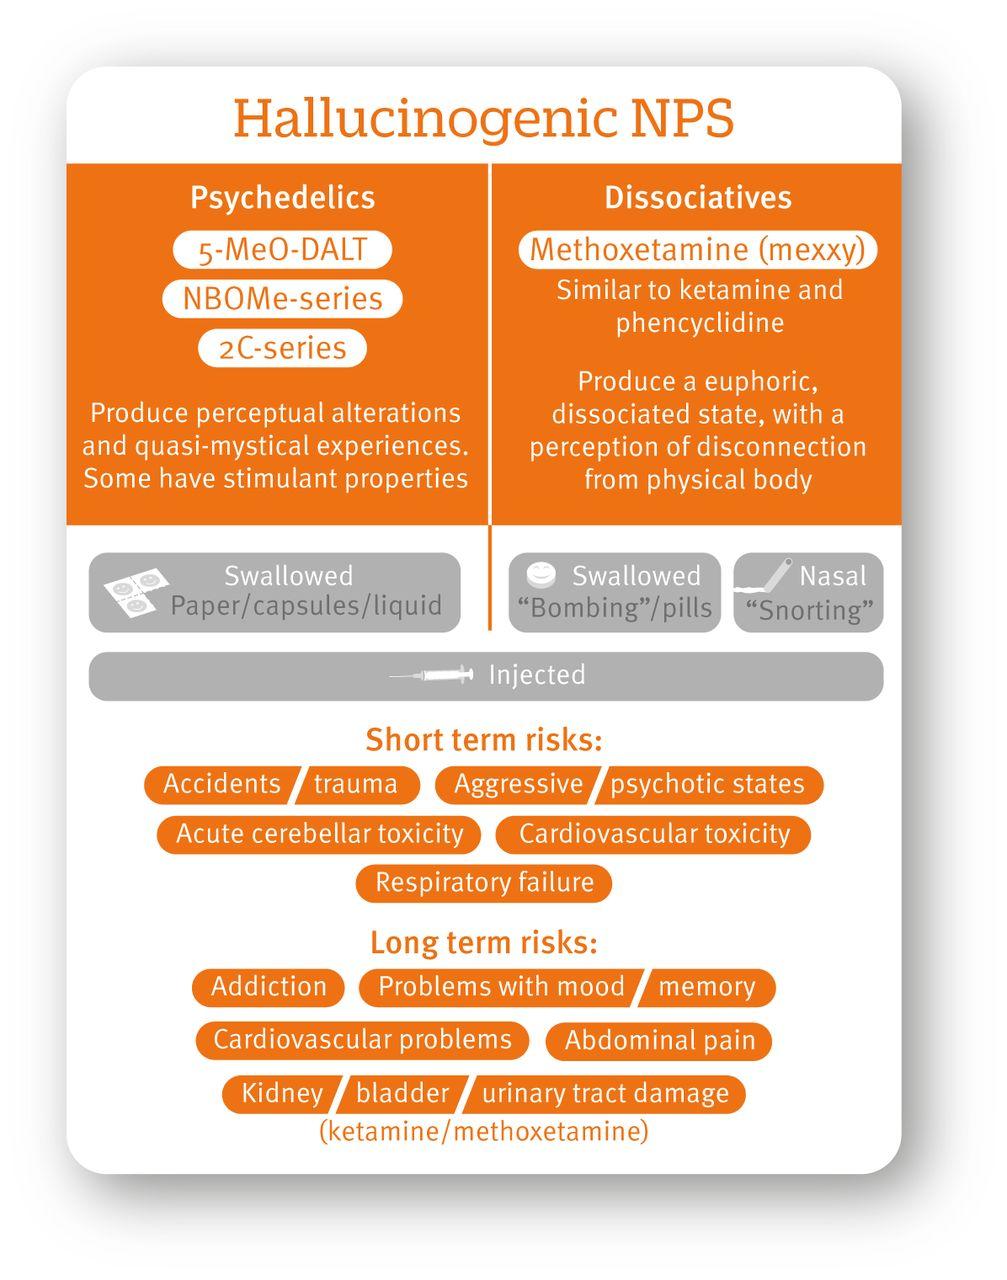 Novel psychoactive substances: types, mechanisms of action